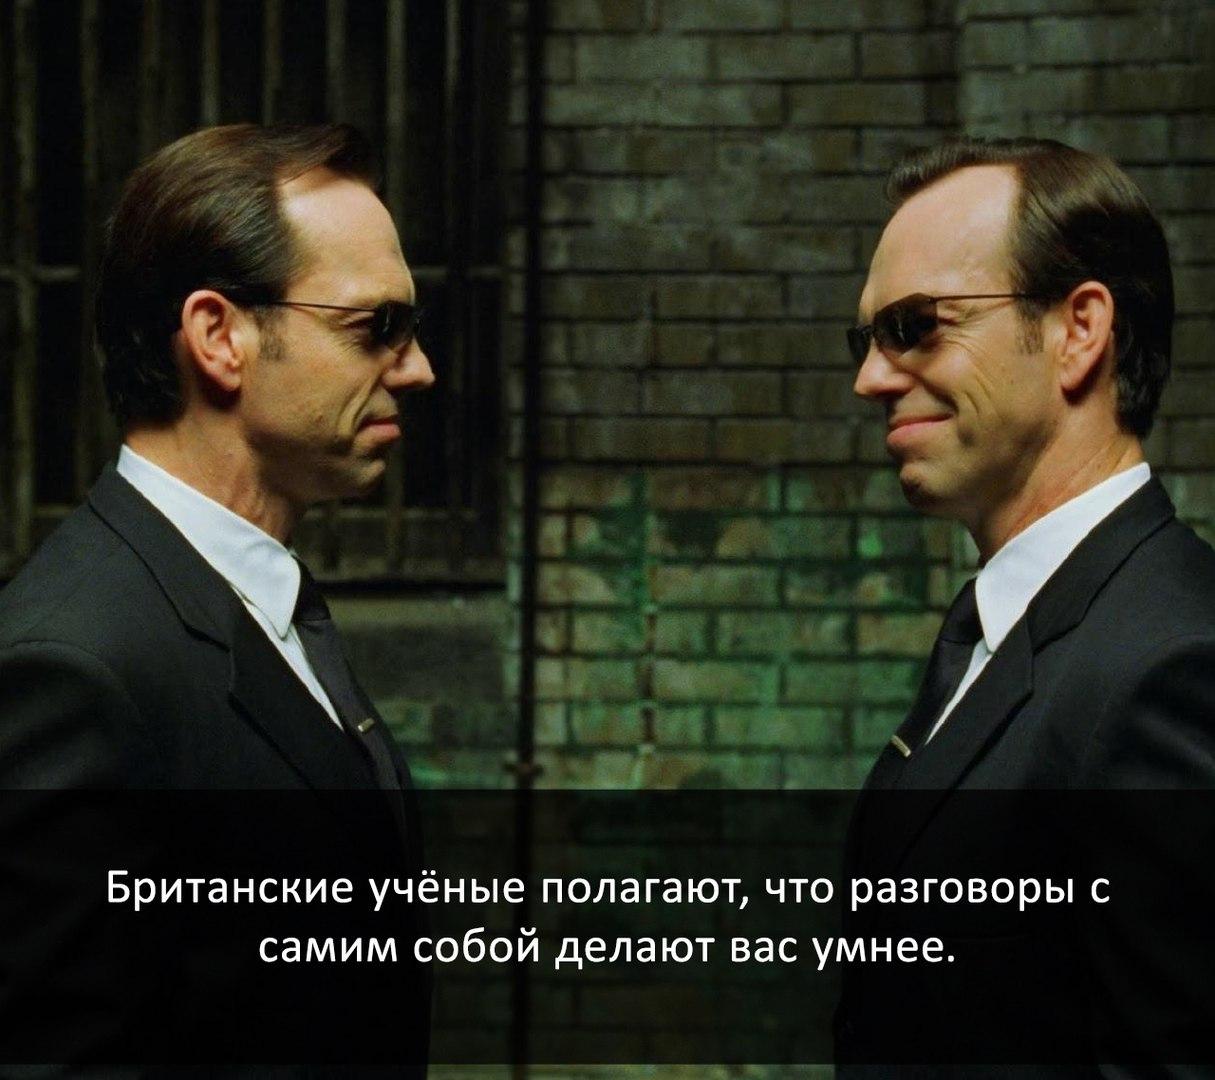 https://pp.userapi.com/c830508/v830508114/4aa6f/2VME8ntc-DI.jpg